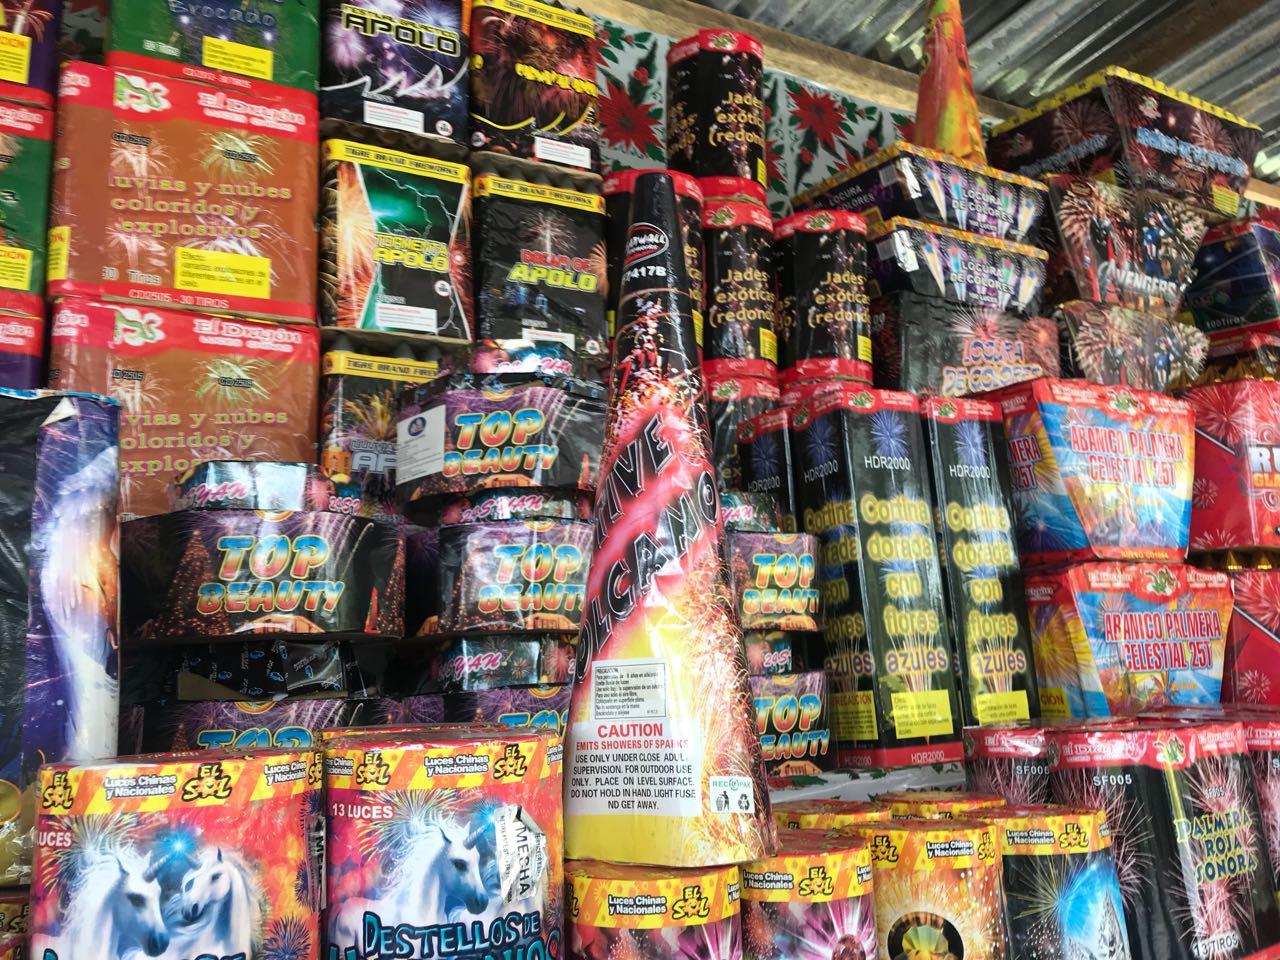 Ventas de juegos pirotécnicos Emisoras Unidas EU Guatemala